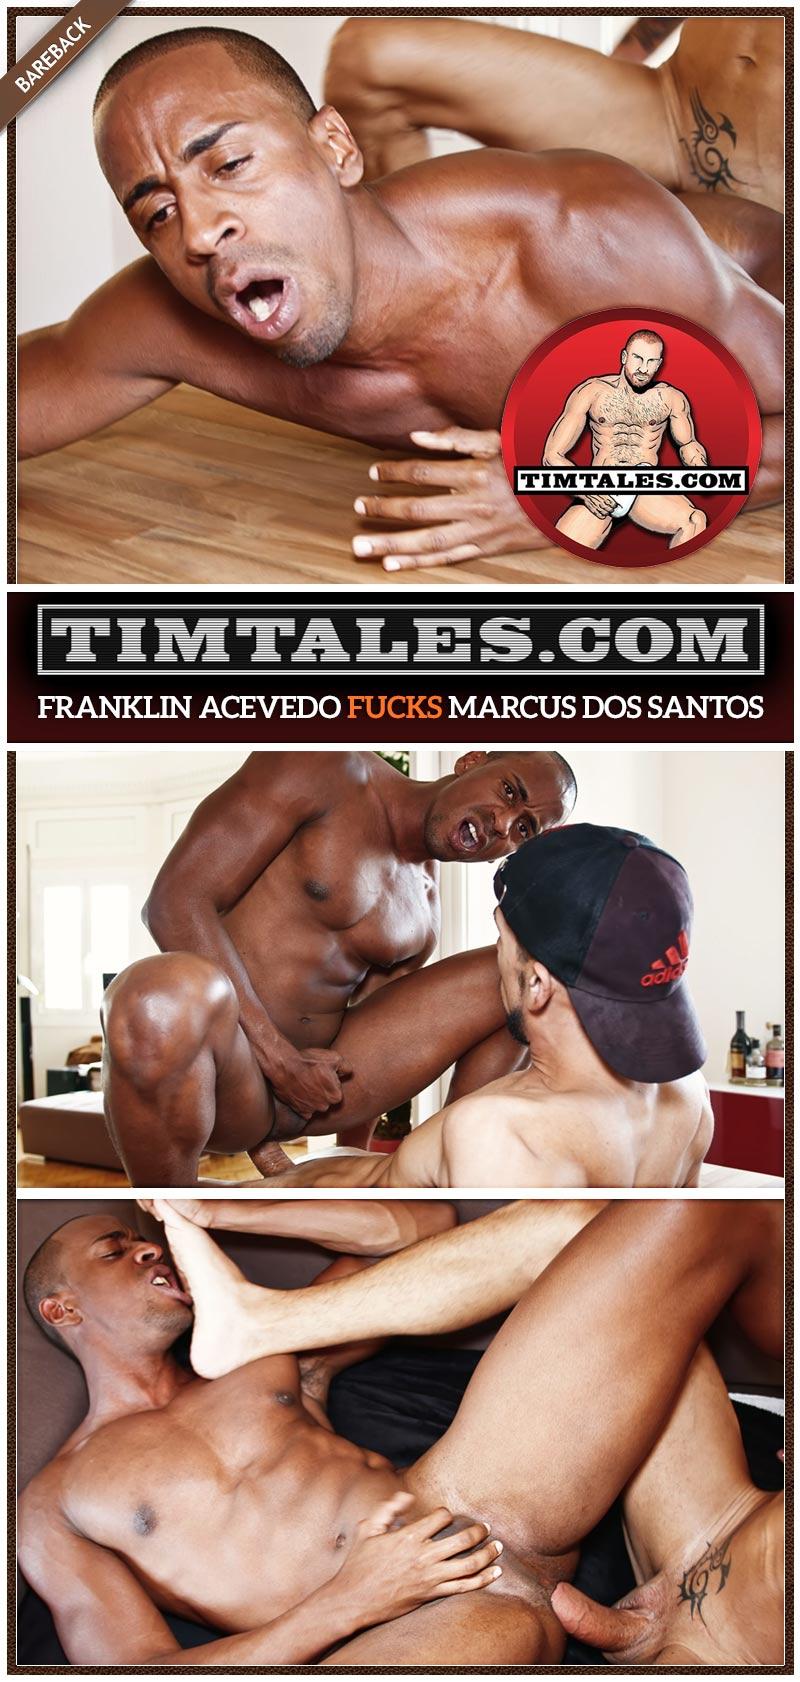 Franklin Acevedo Fucks Marcus Dos Santos at TimTales